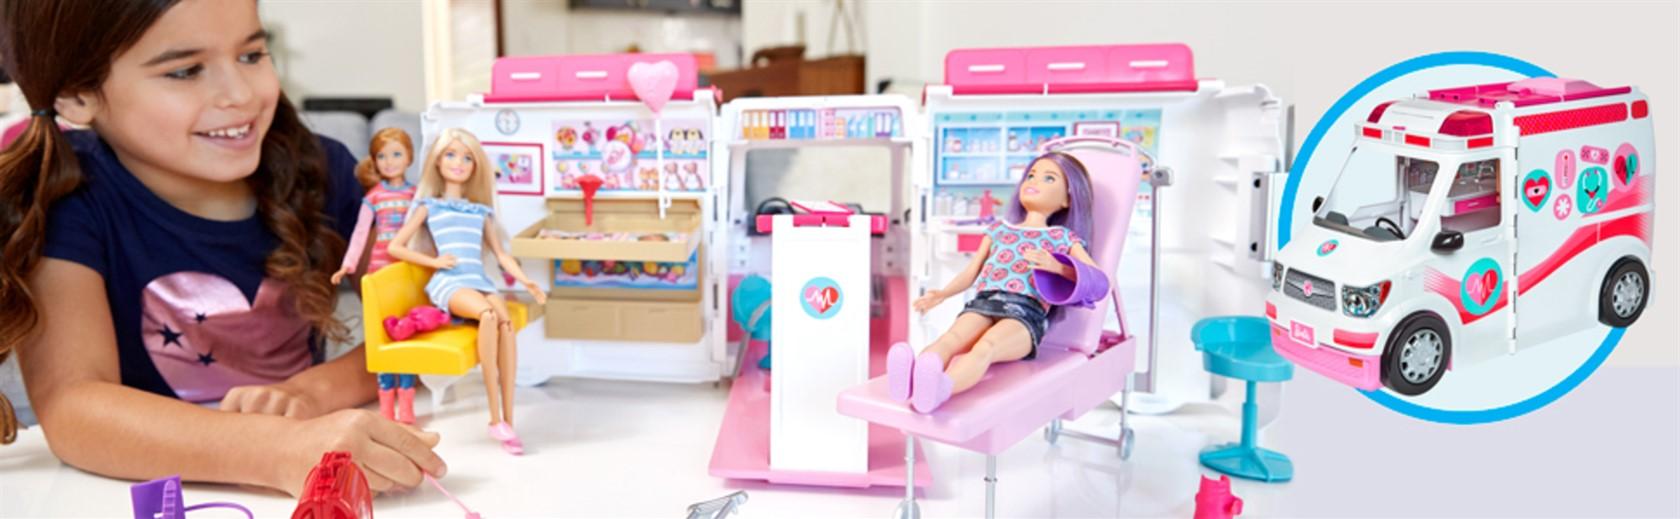 Barbie - Ambulans och mobil klinik